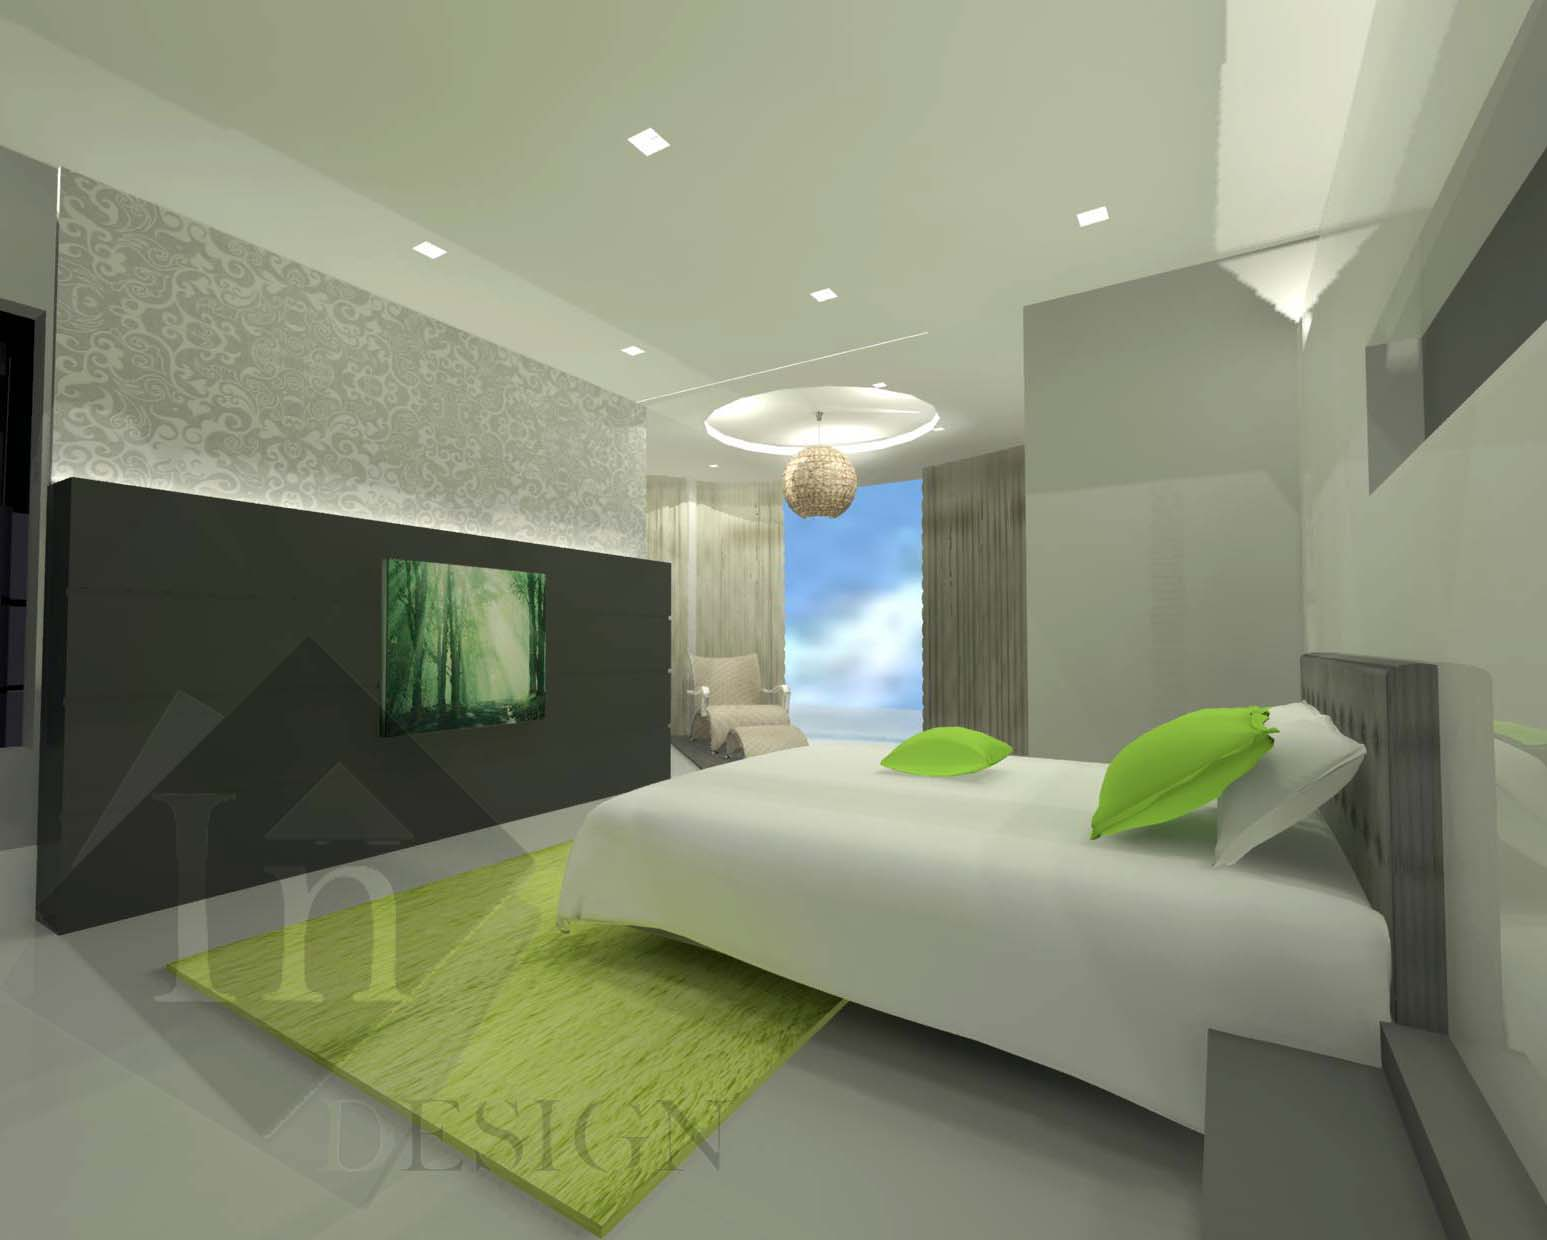 Living room wallpaper bangalore living room design for Living room designs bangalore